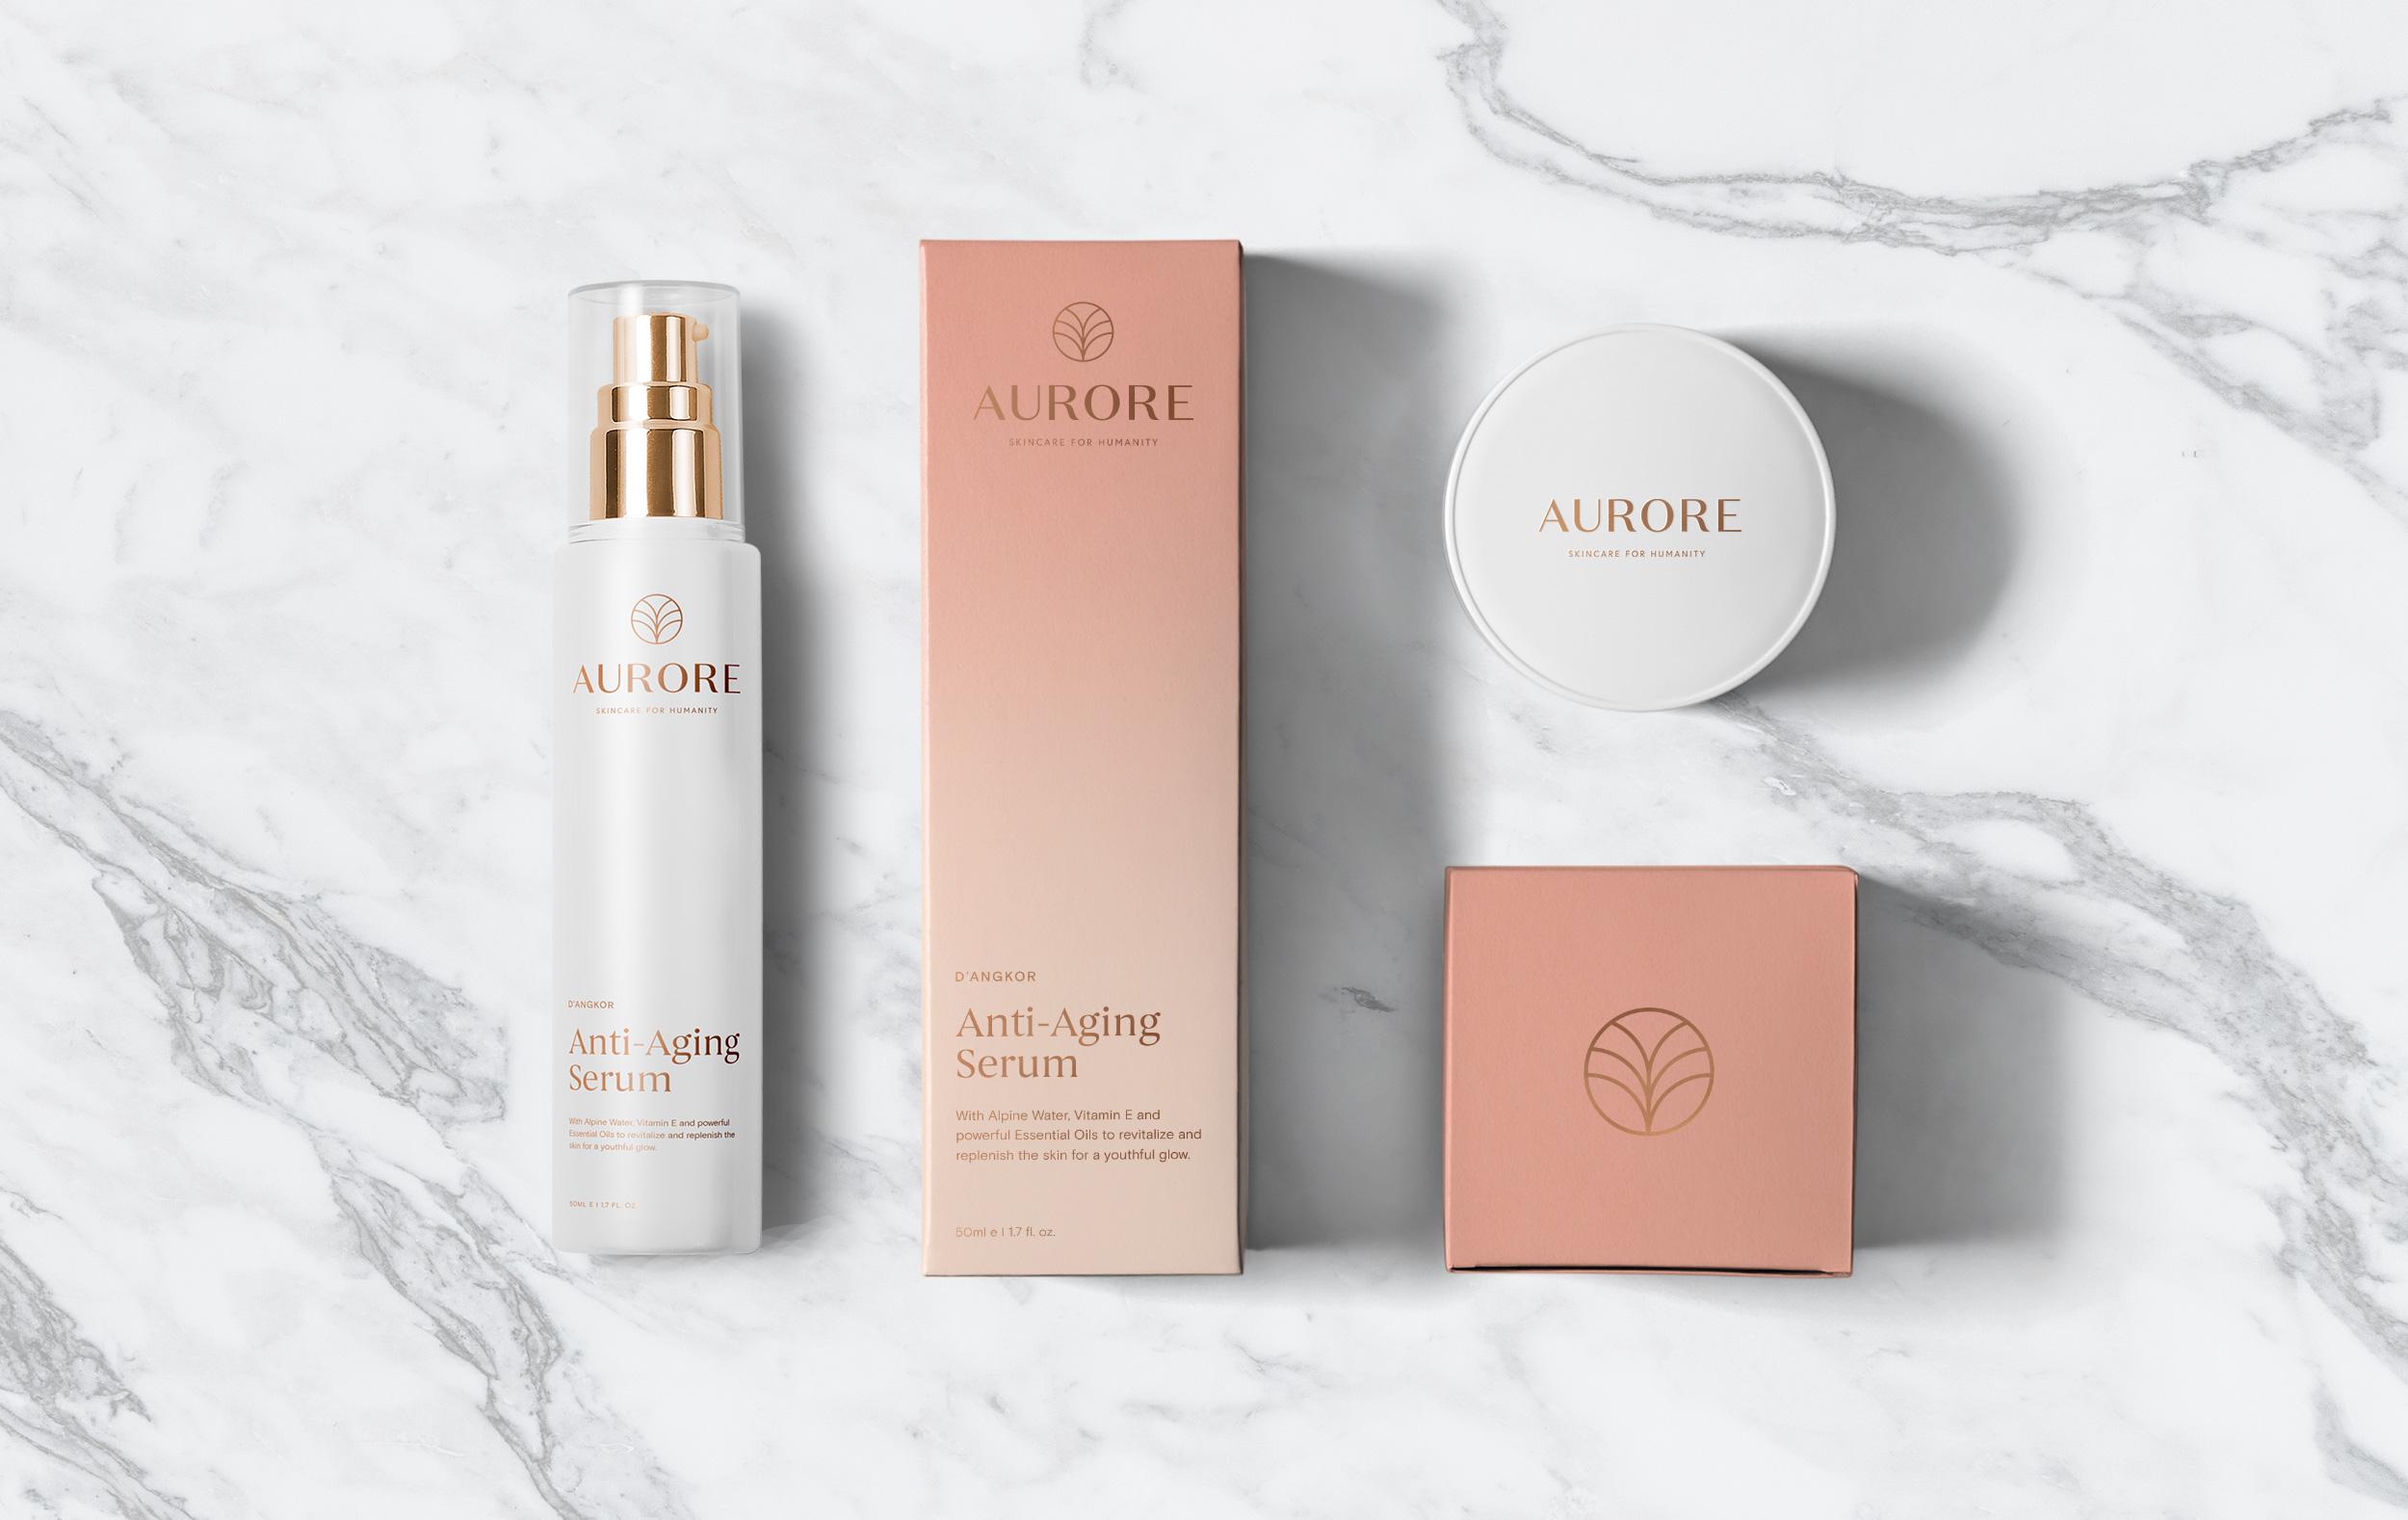 Aurore Skincare: Naming, Branding + Packaging